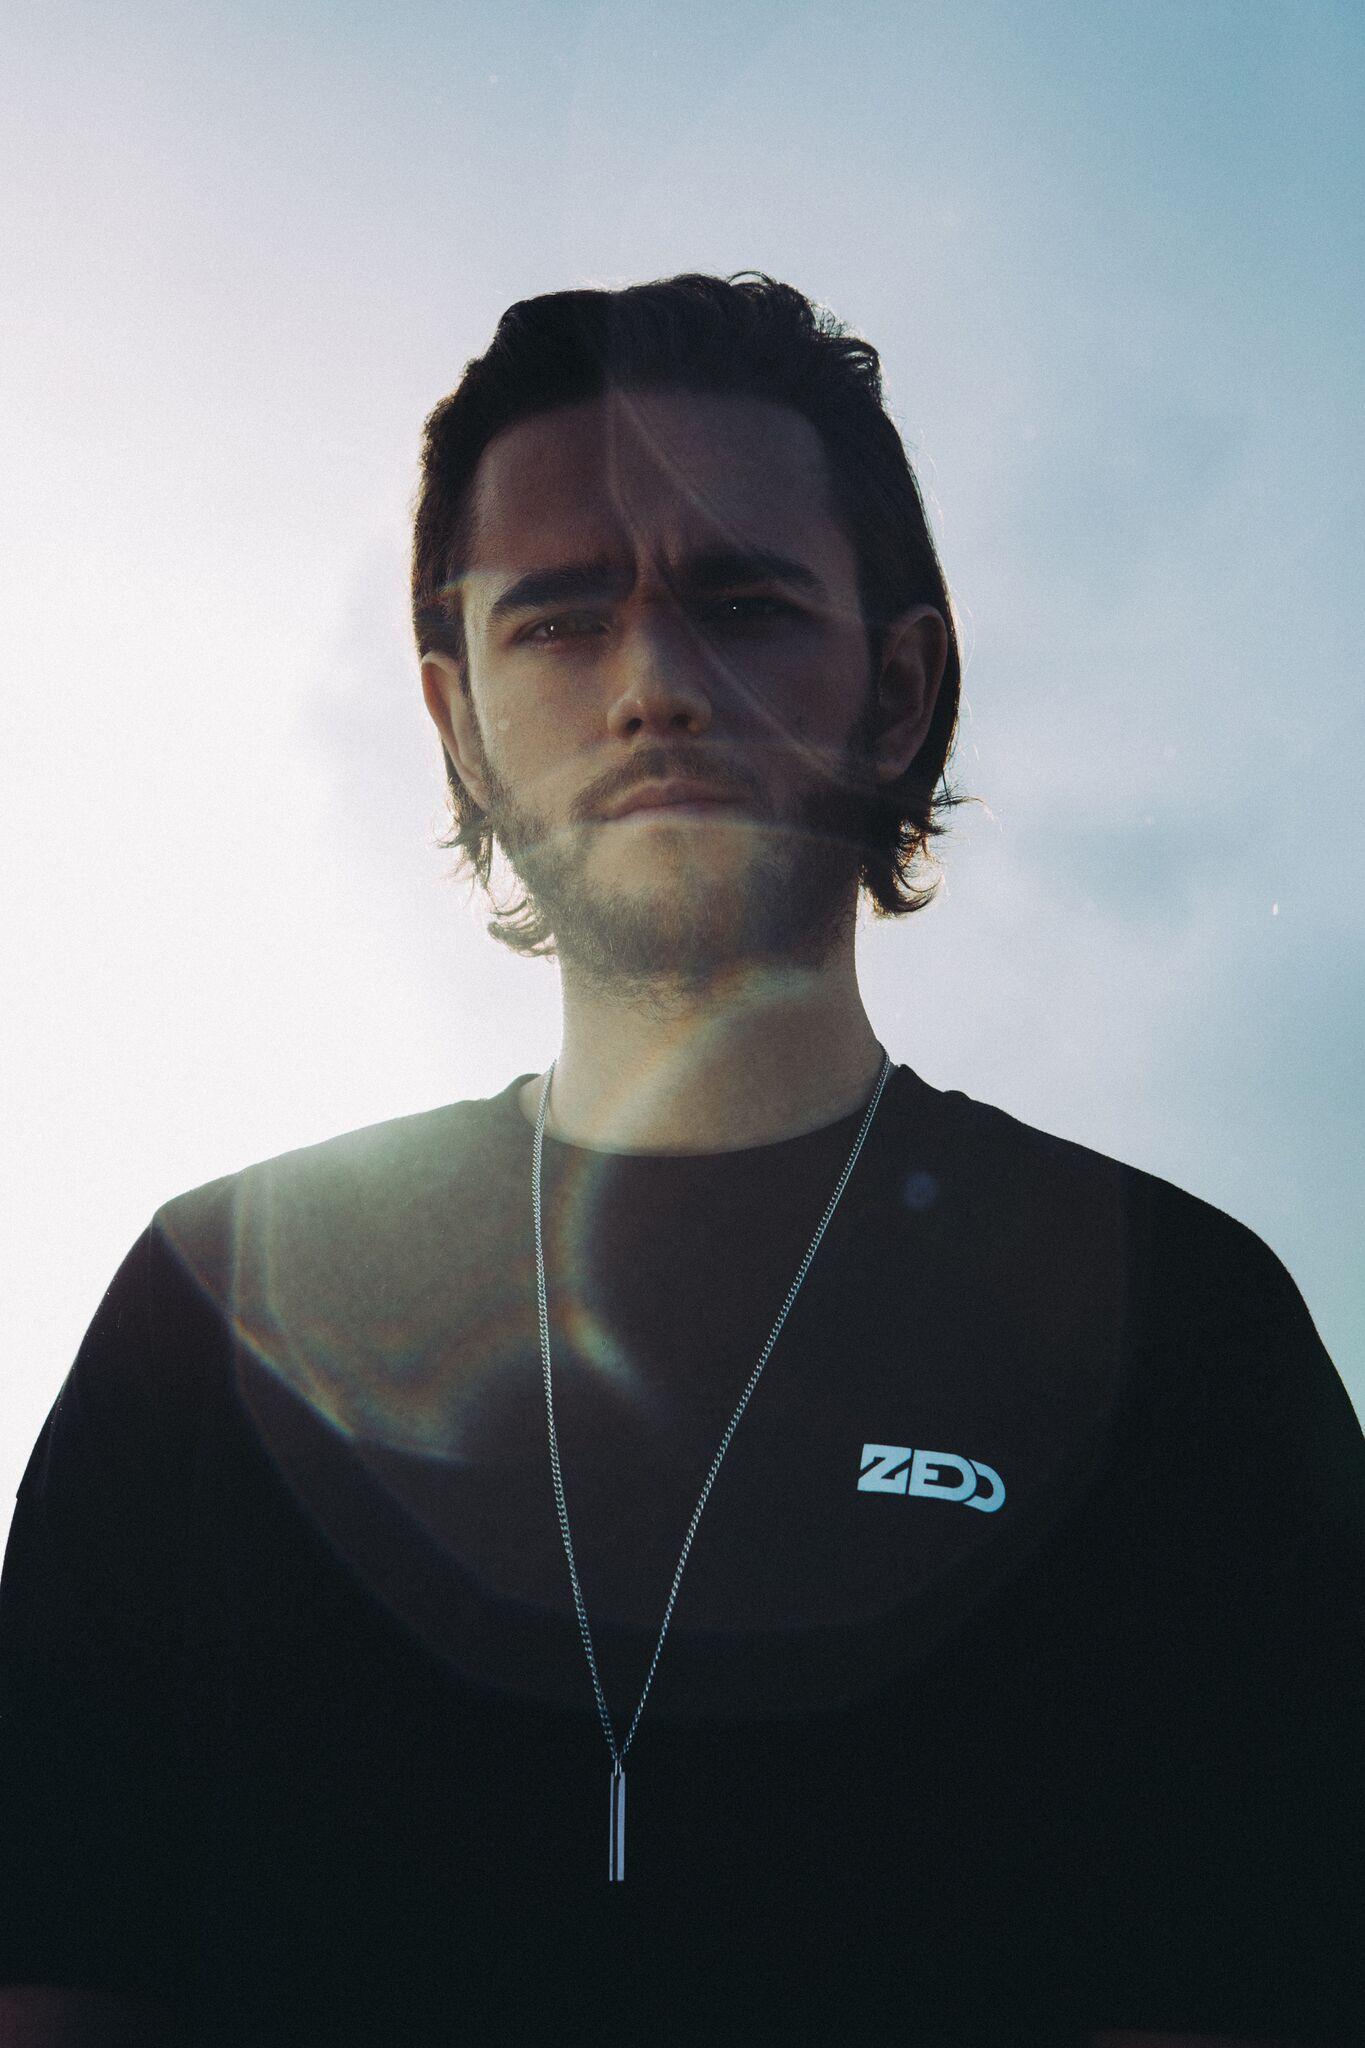 Zedd x Vitaly Collection